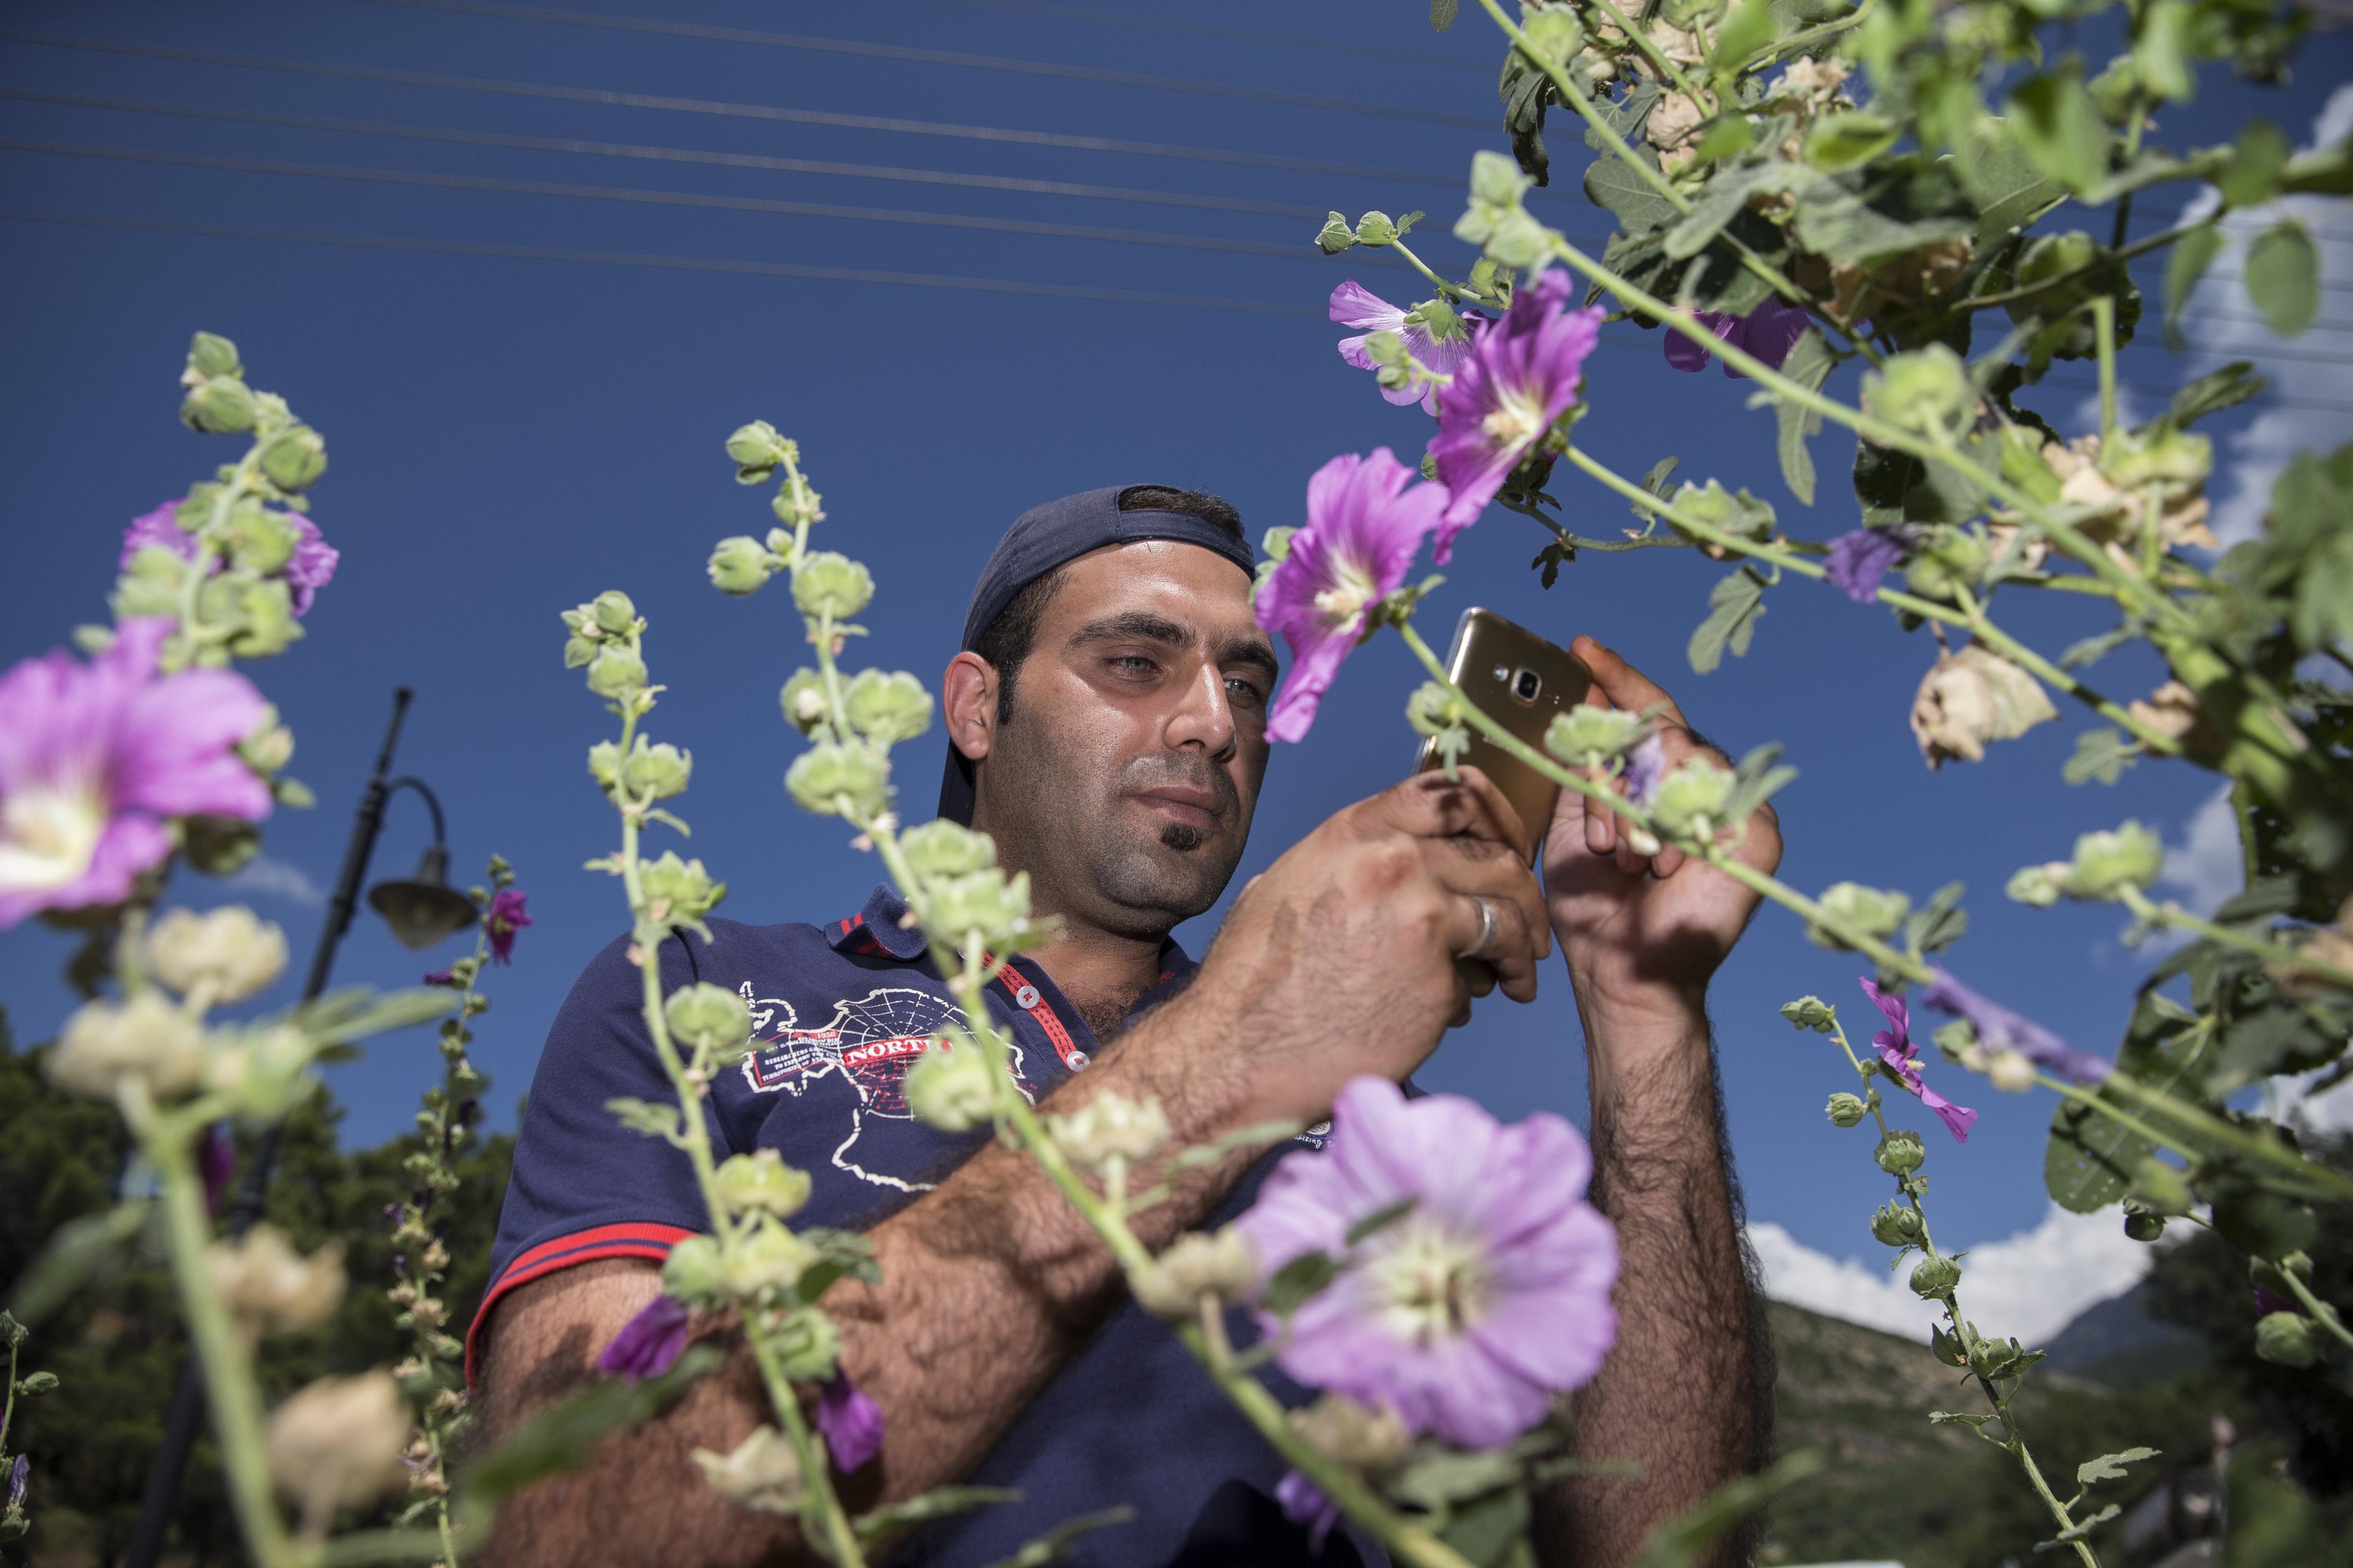 Mohammed fotografiert Blumen